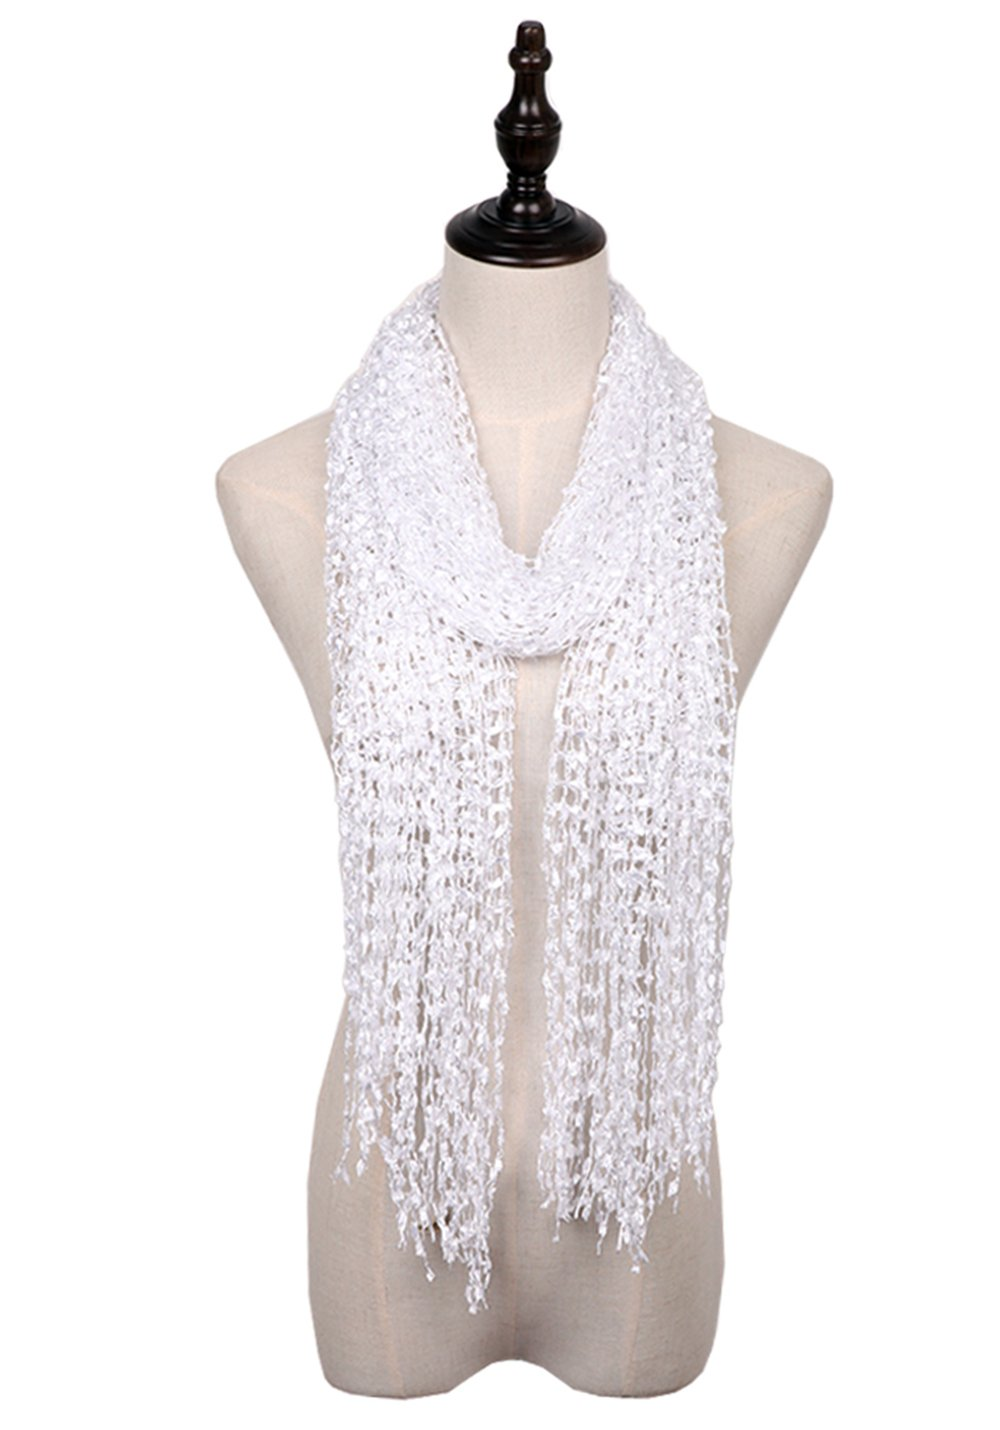 MissShorthair Lightweight Confetti Scarf Solid Women Shawls Wraps For Evening Dresses (White)